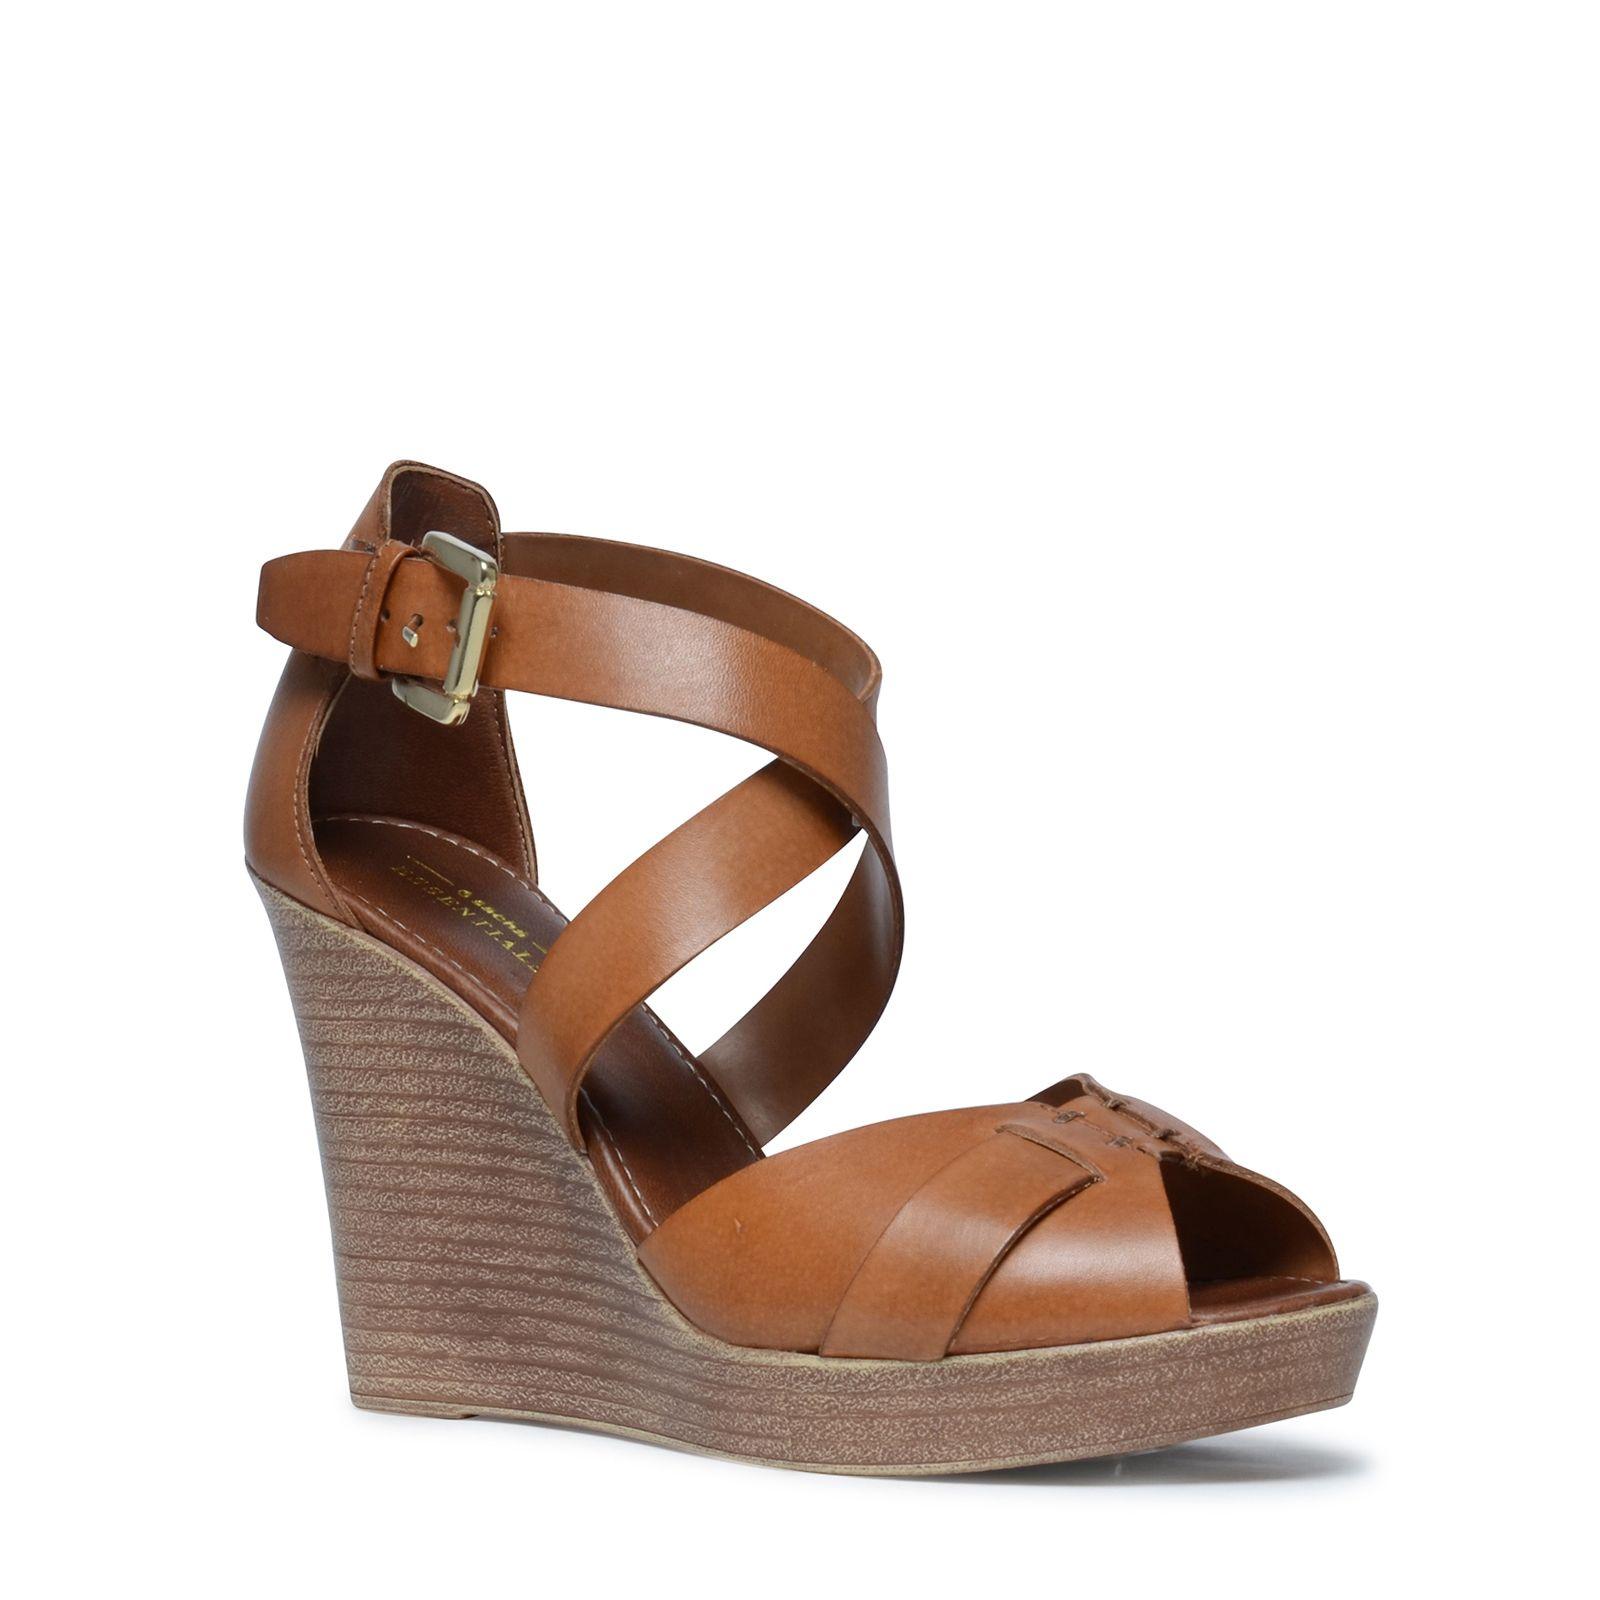 Dames schoenen online shoppen